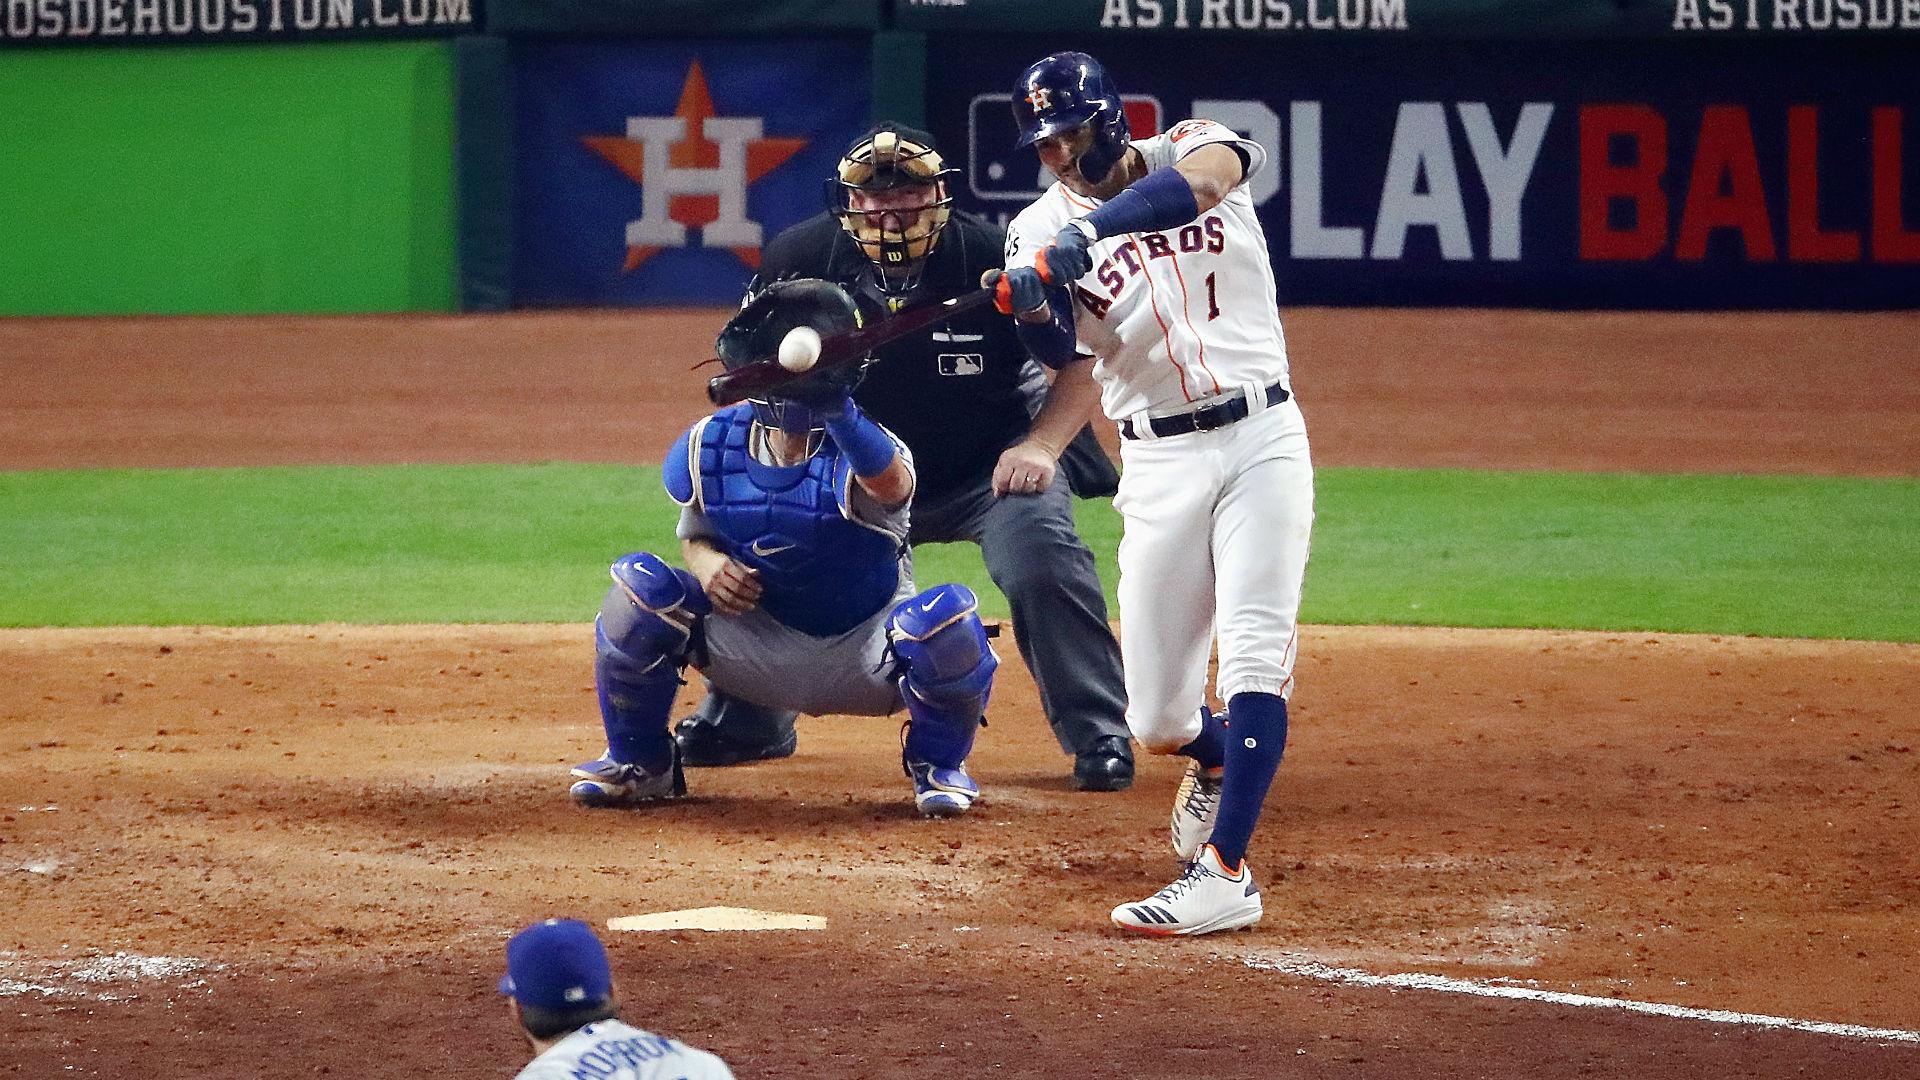 World Series 2017: Carlos Correa's home run in Game 5 sets 2017 record